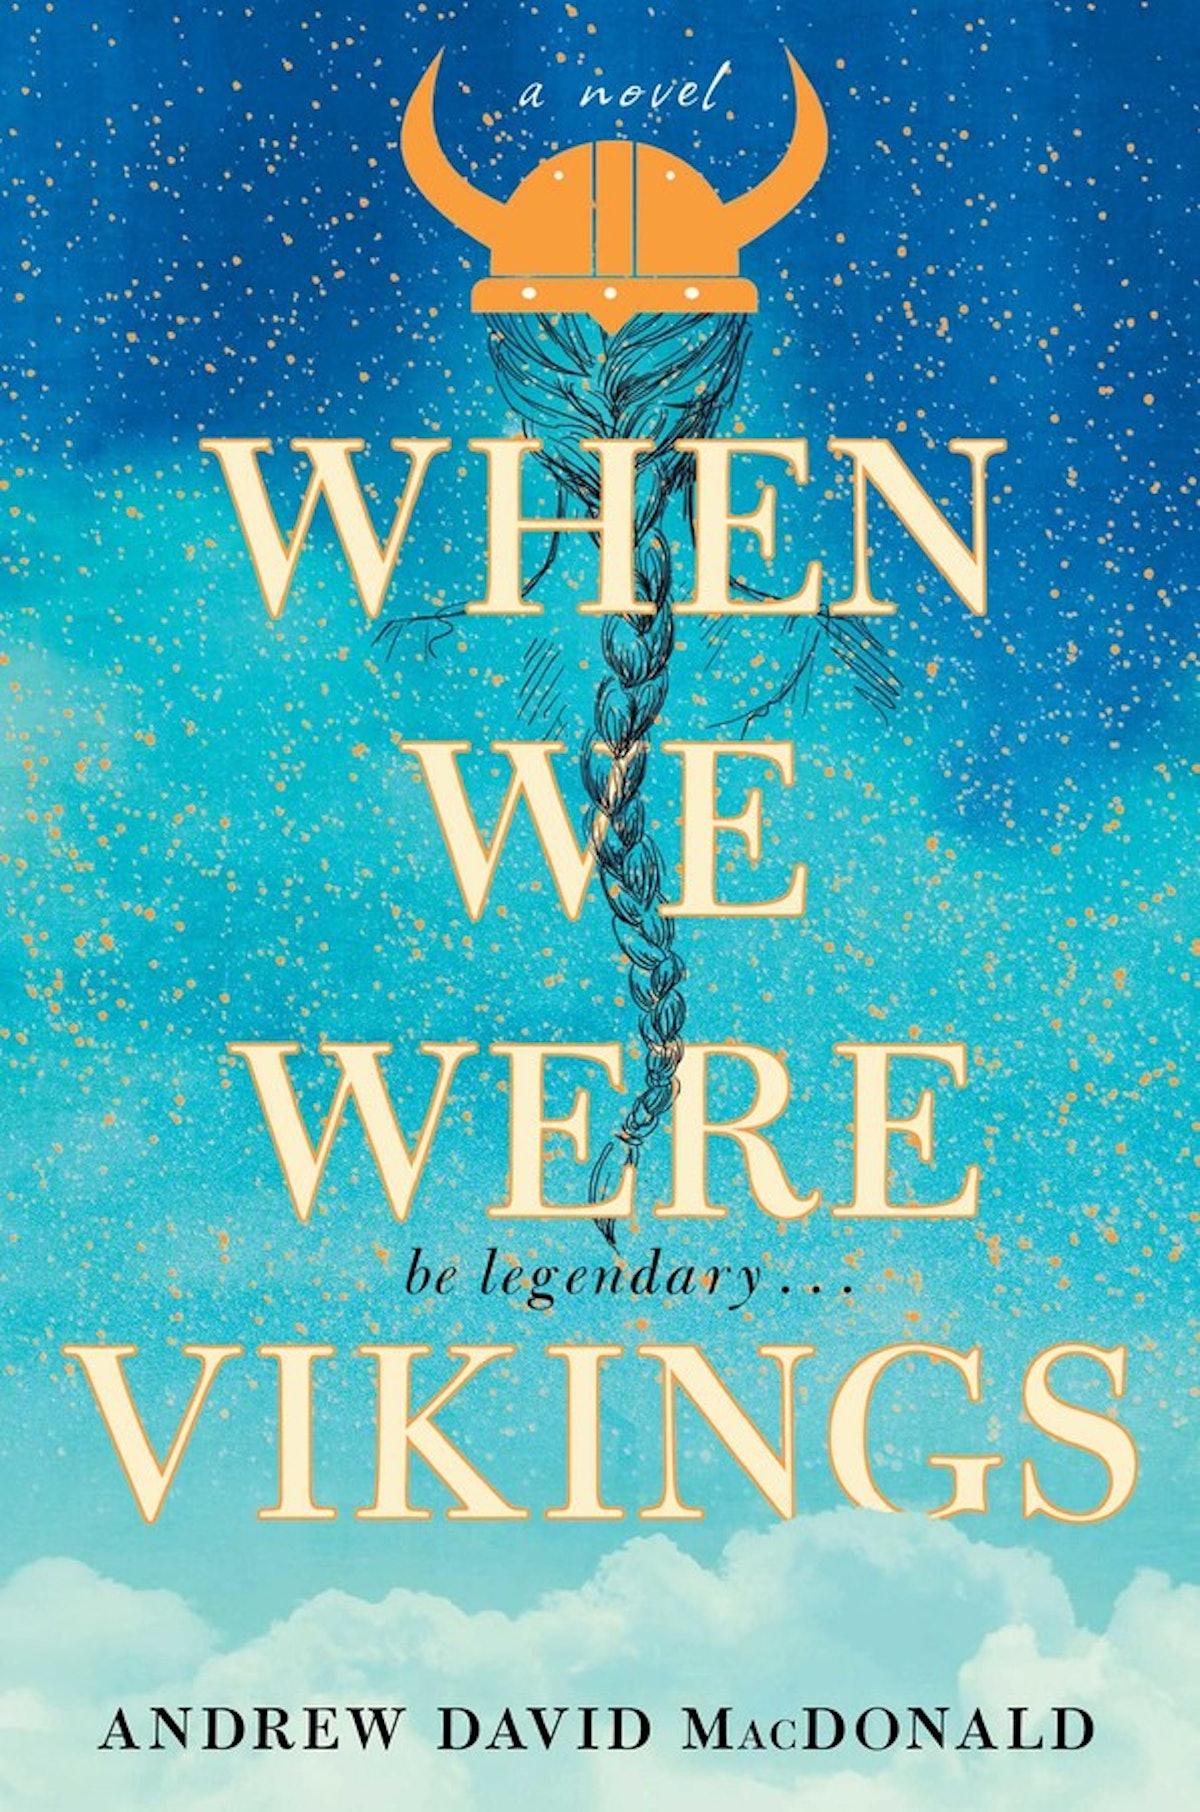 'When We Were Vikings' by Andrew David MacDonald